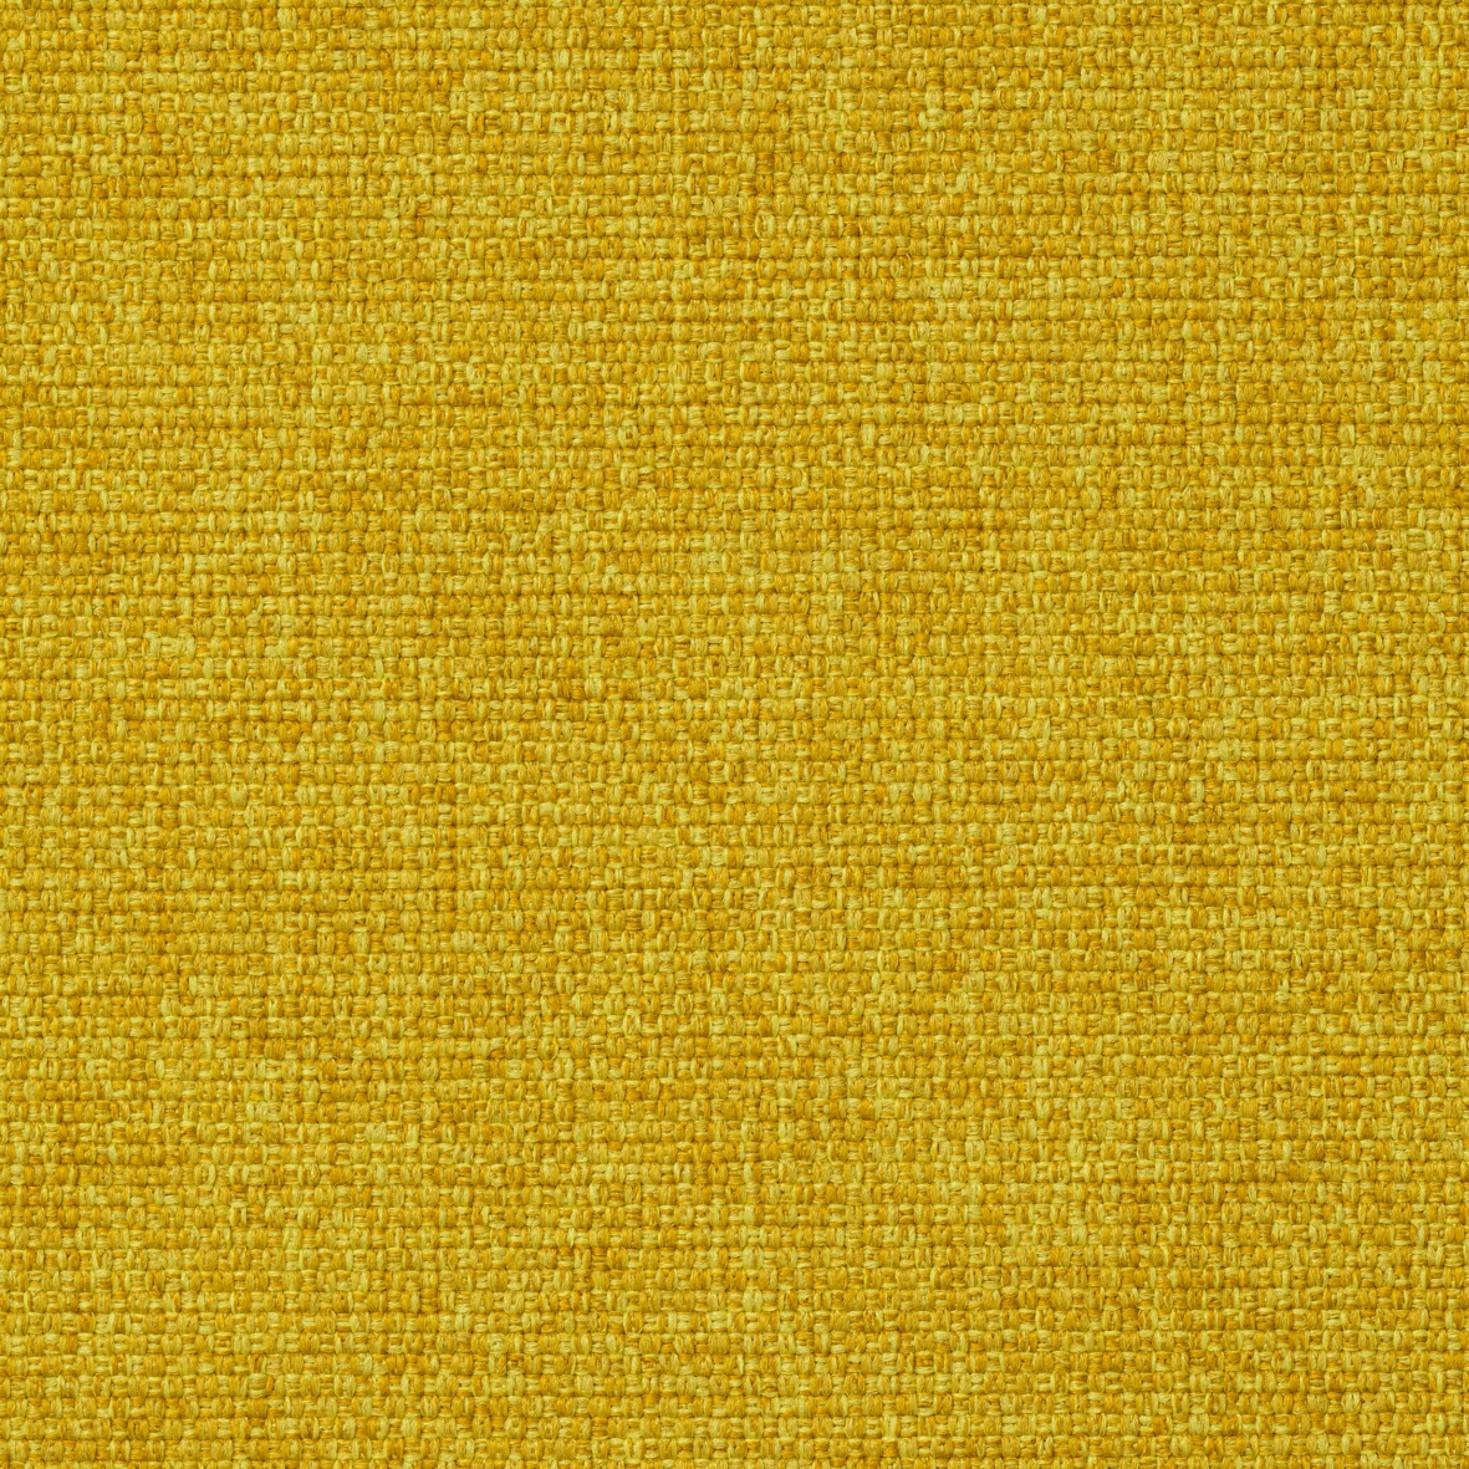 Medley Mustard Yellow 62002